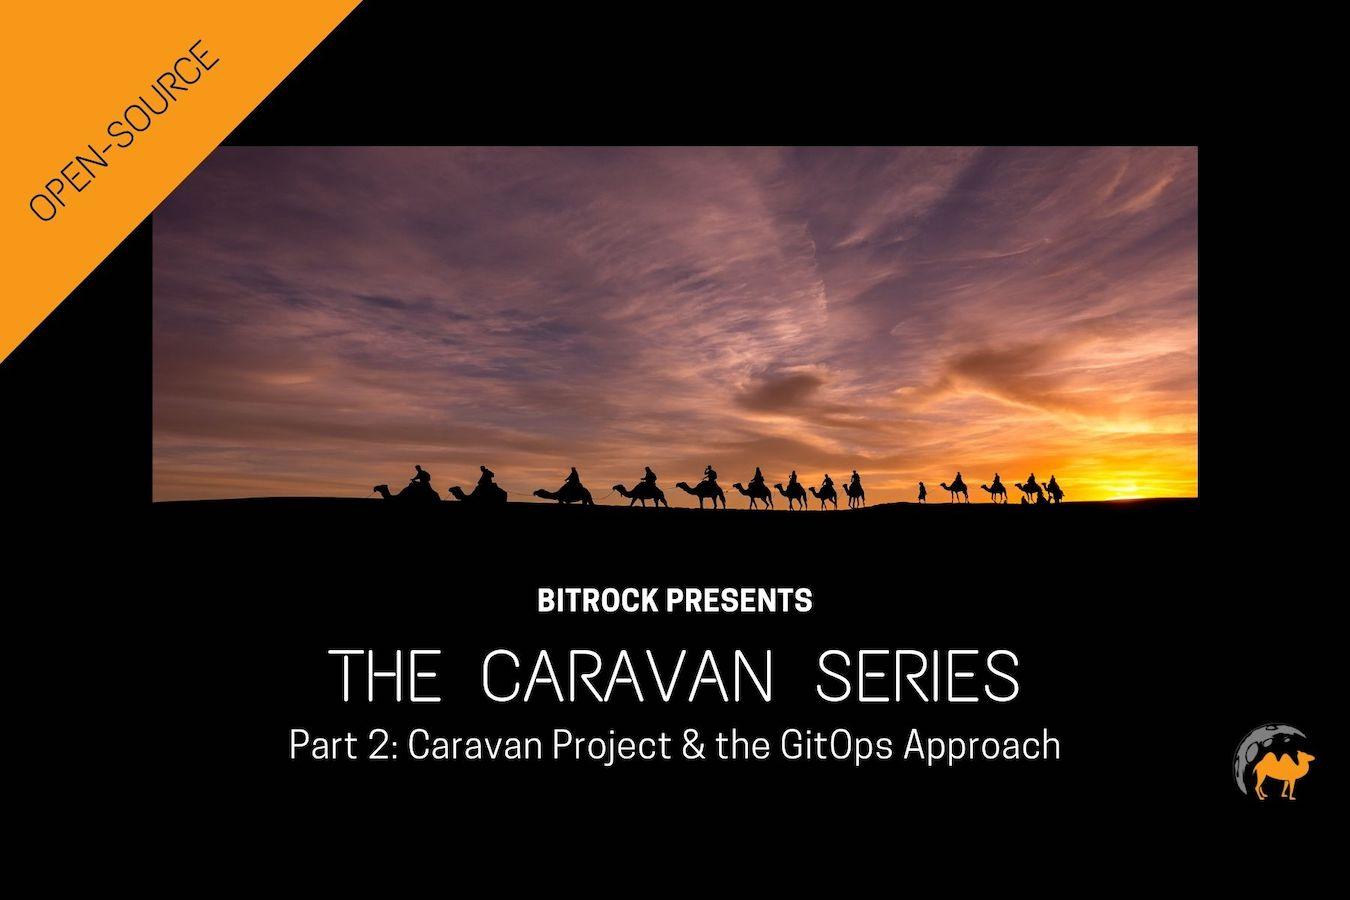 Caravan Series - GitOps